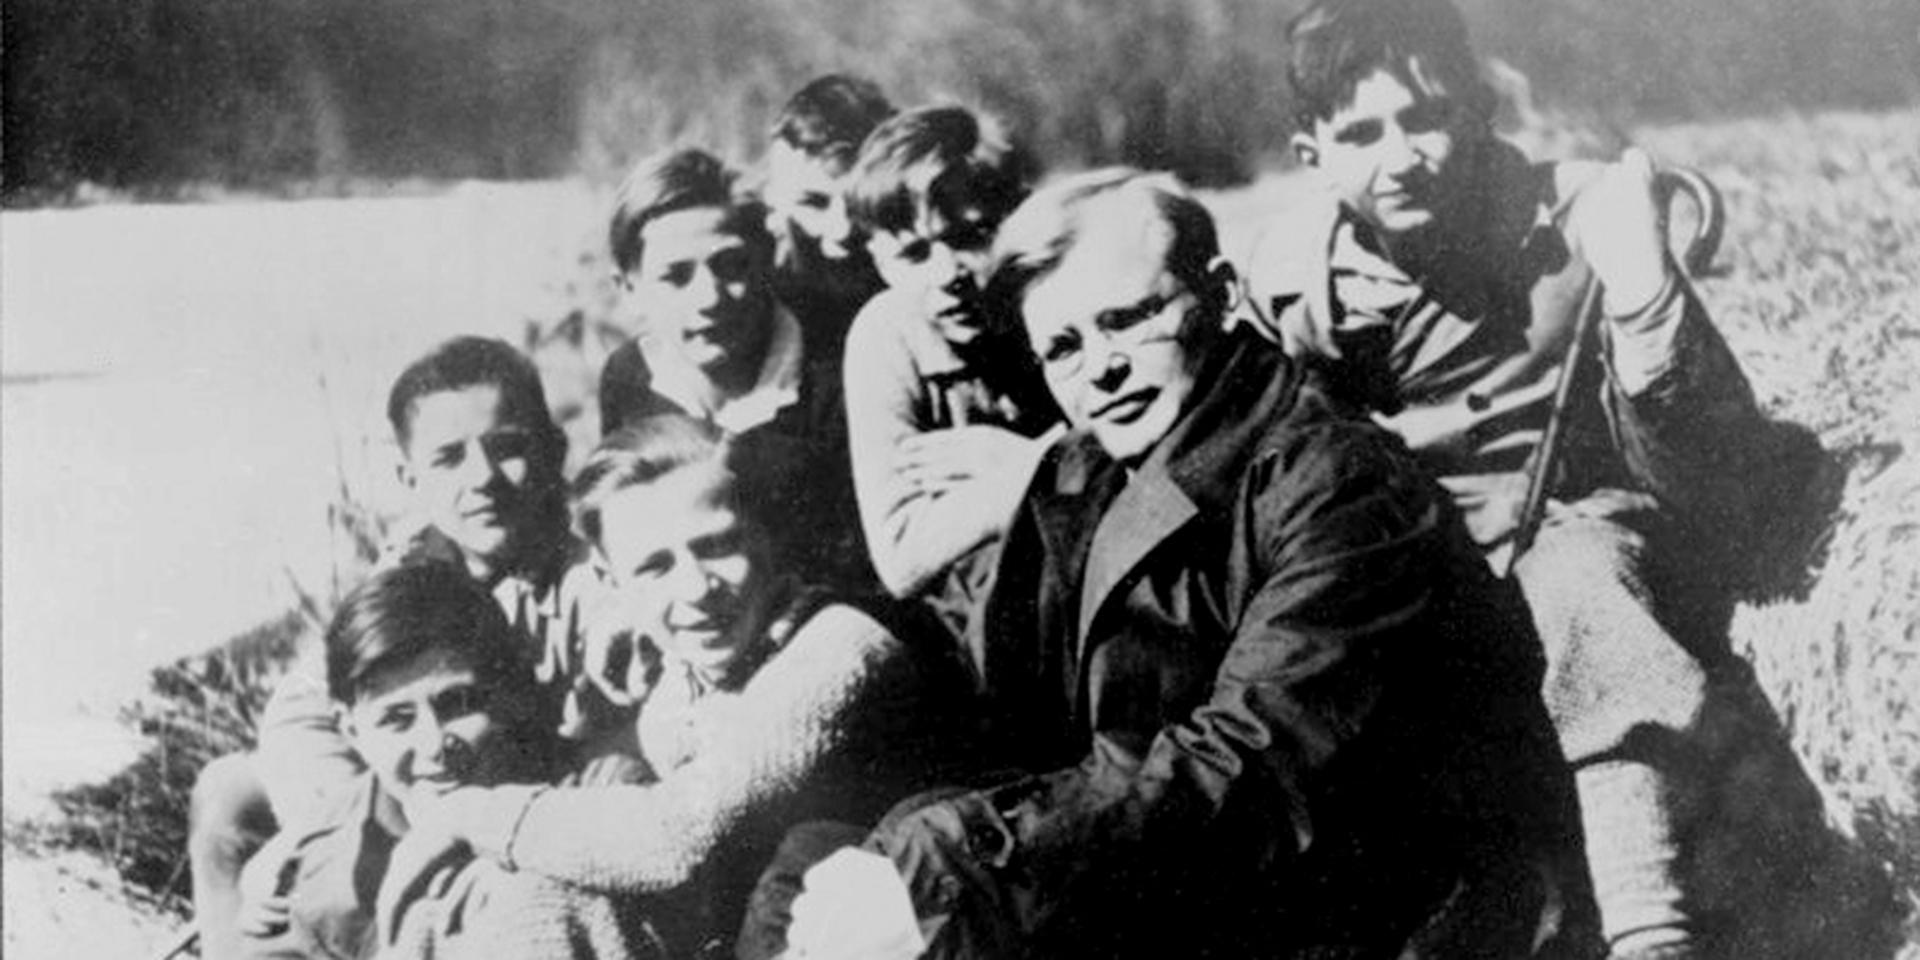 Dietrich Bonhoeffer mit Schülern,© Bundesarchiv via Wikimedia Commons